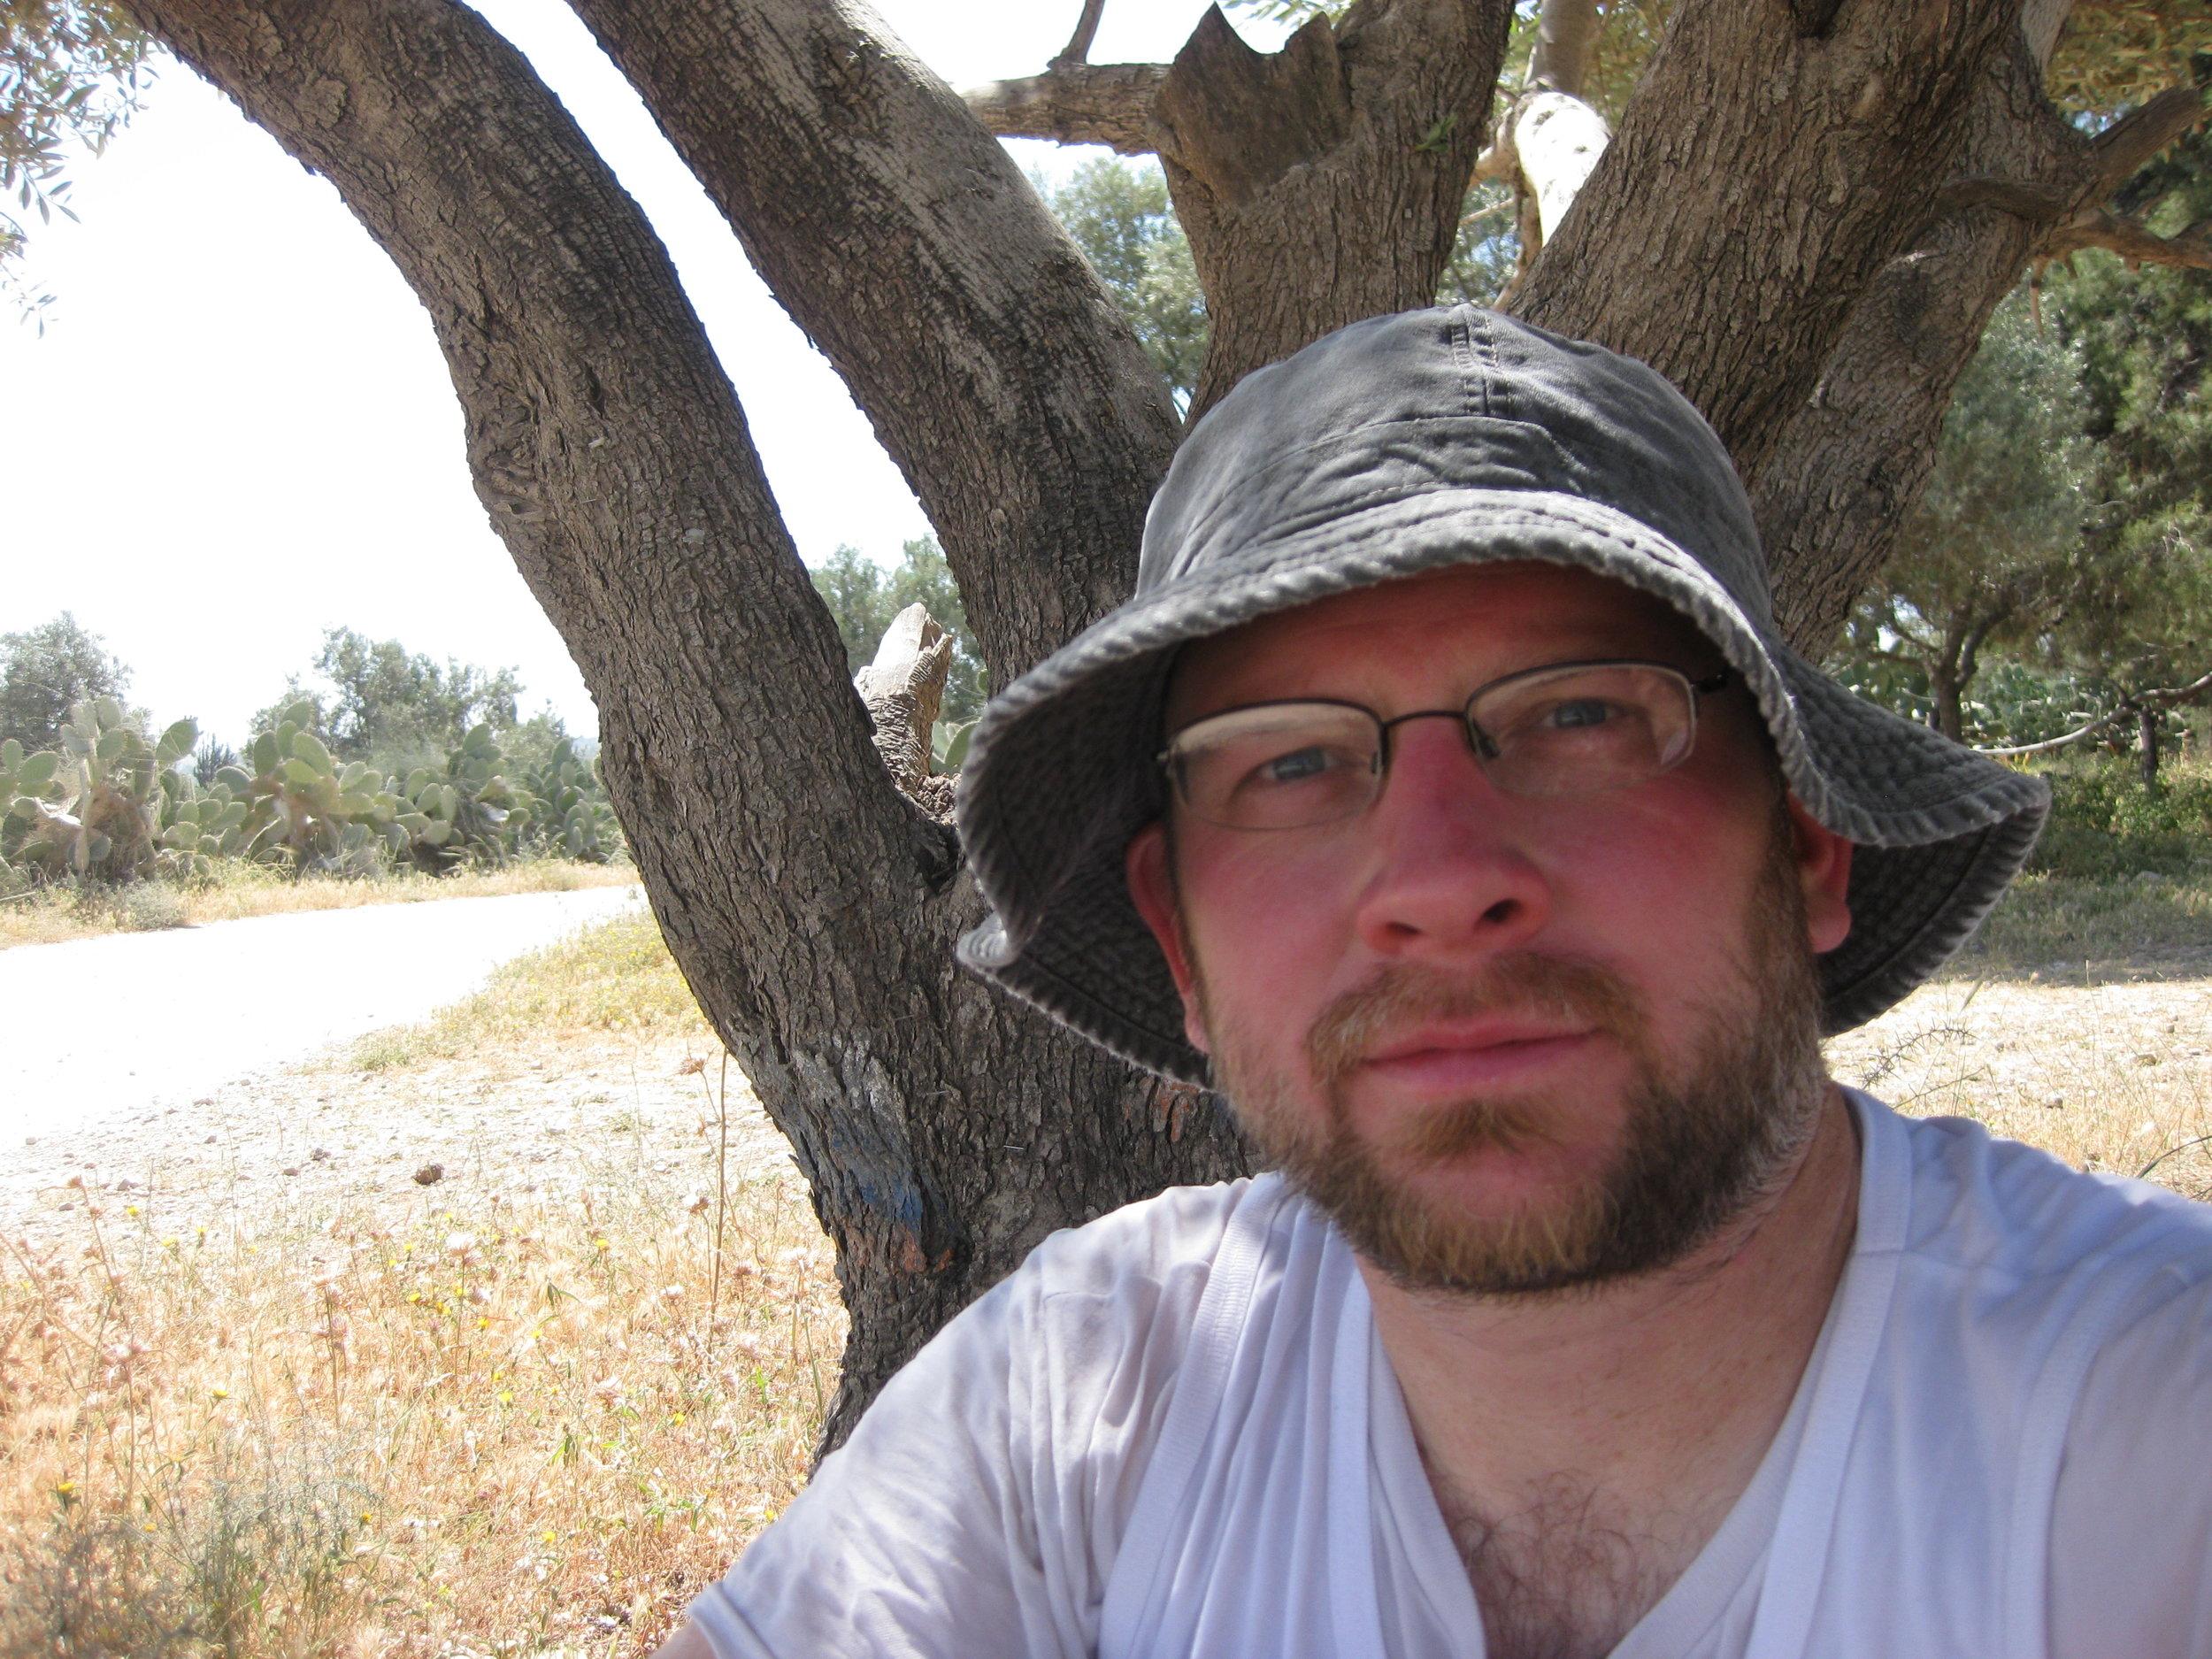 In the Ben Shemen forest